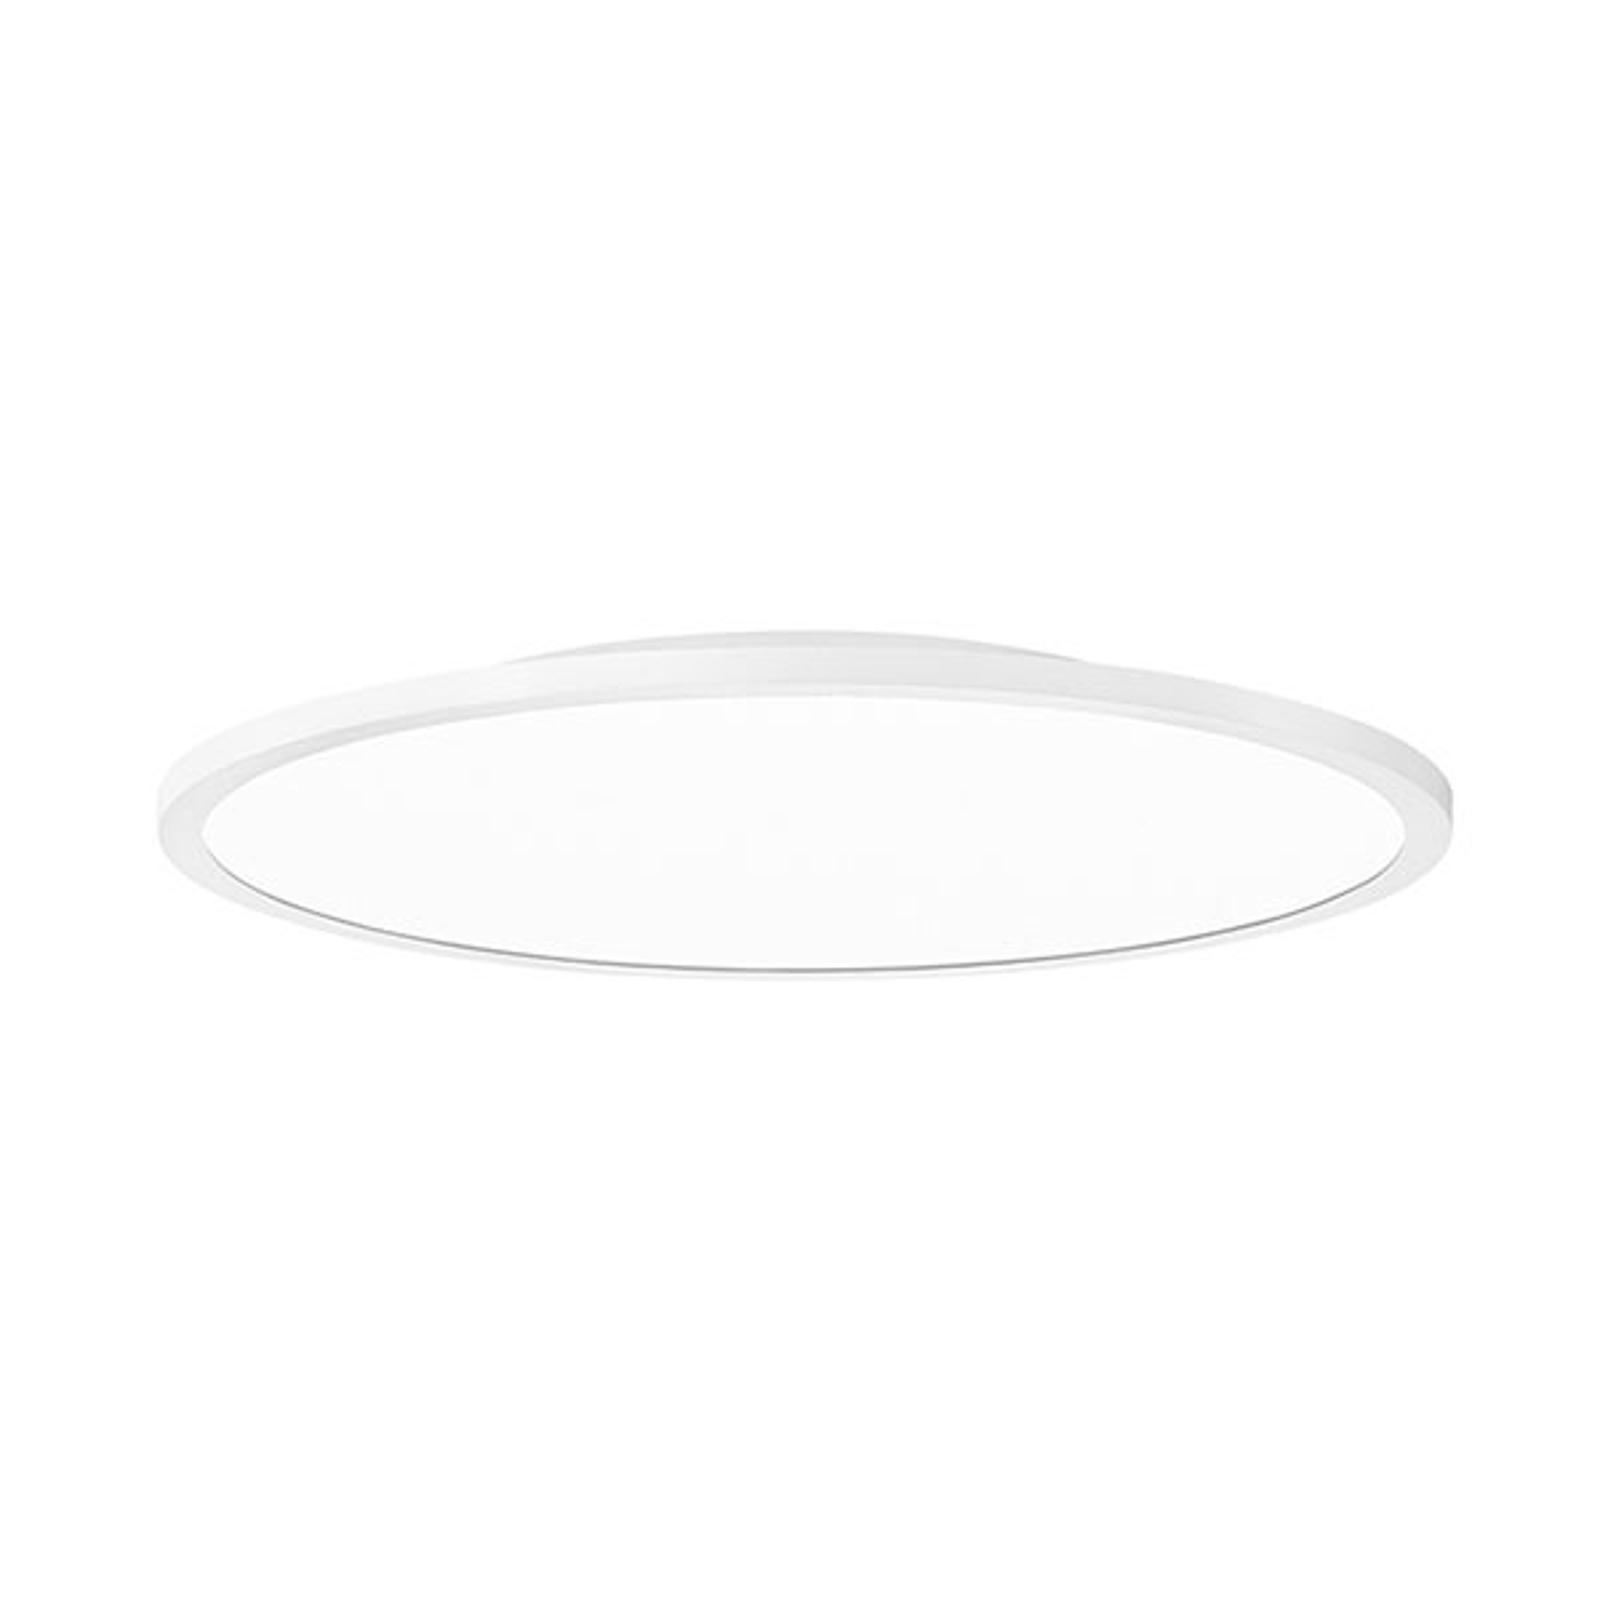 FL555AB LED-loftlampe Ø 55 cm DALI 6500 lm 4000 K